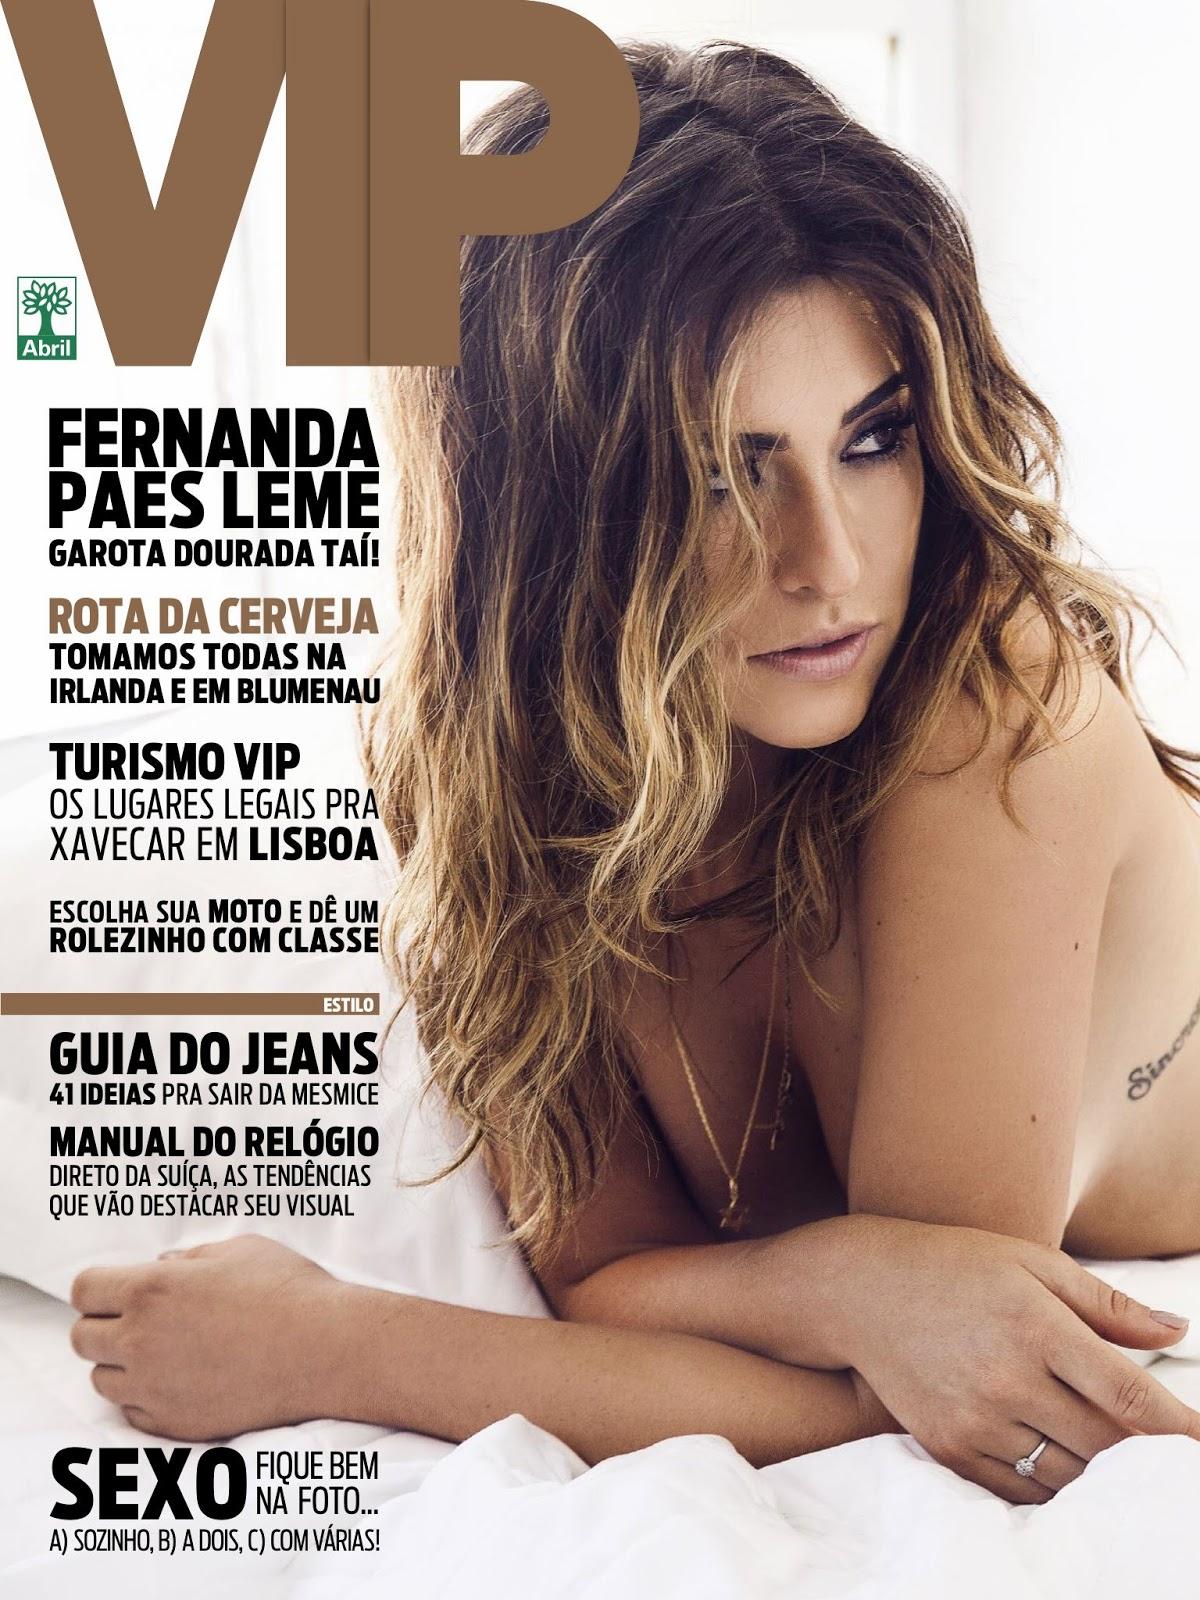 baixar Revista Vip - Fernanda Paes Leme - Maio 2014 download